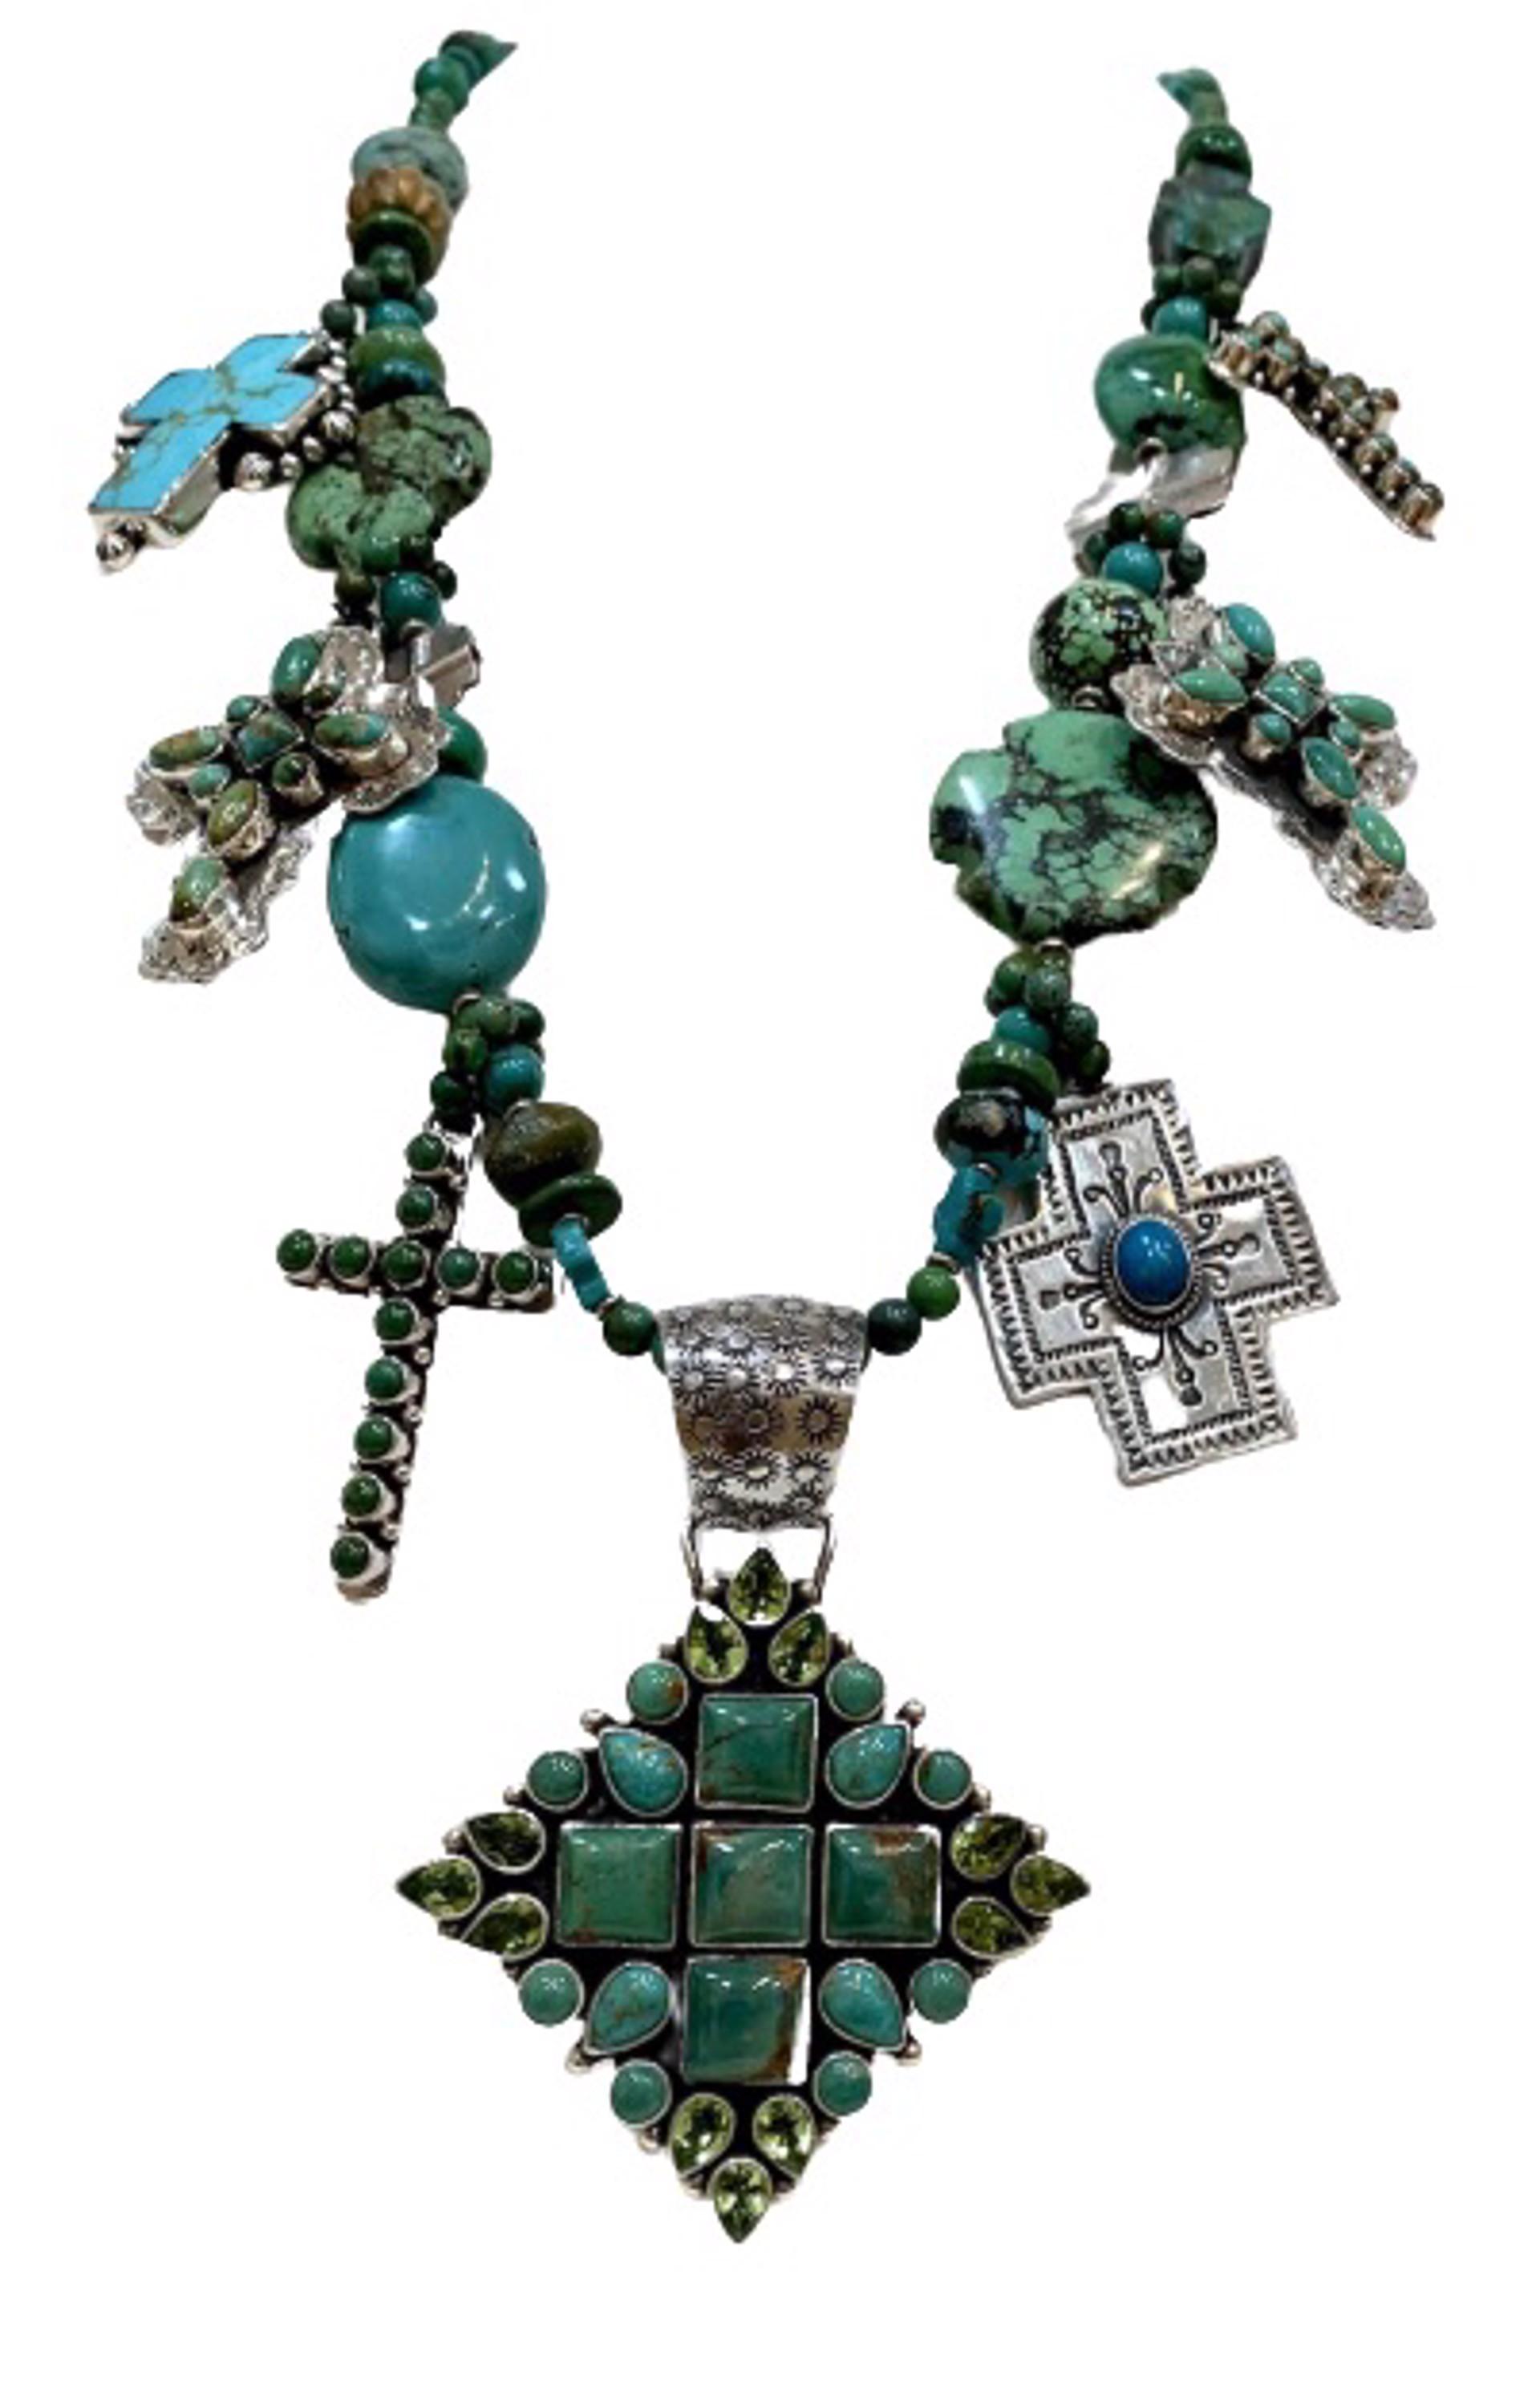 KY 1360 - Single Strand Turquoise with Peridot Crosses by Kim Yubeta